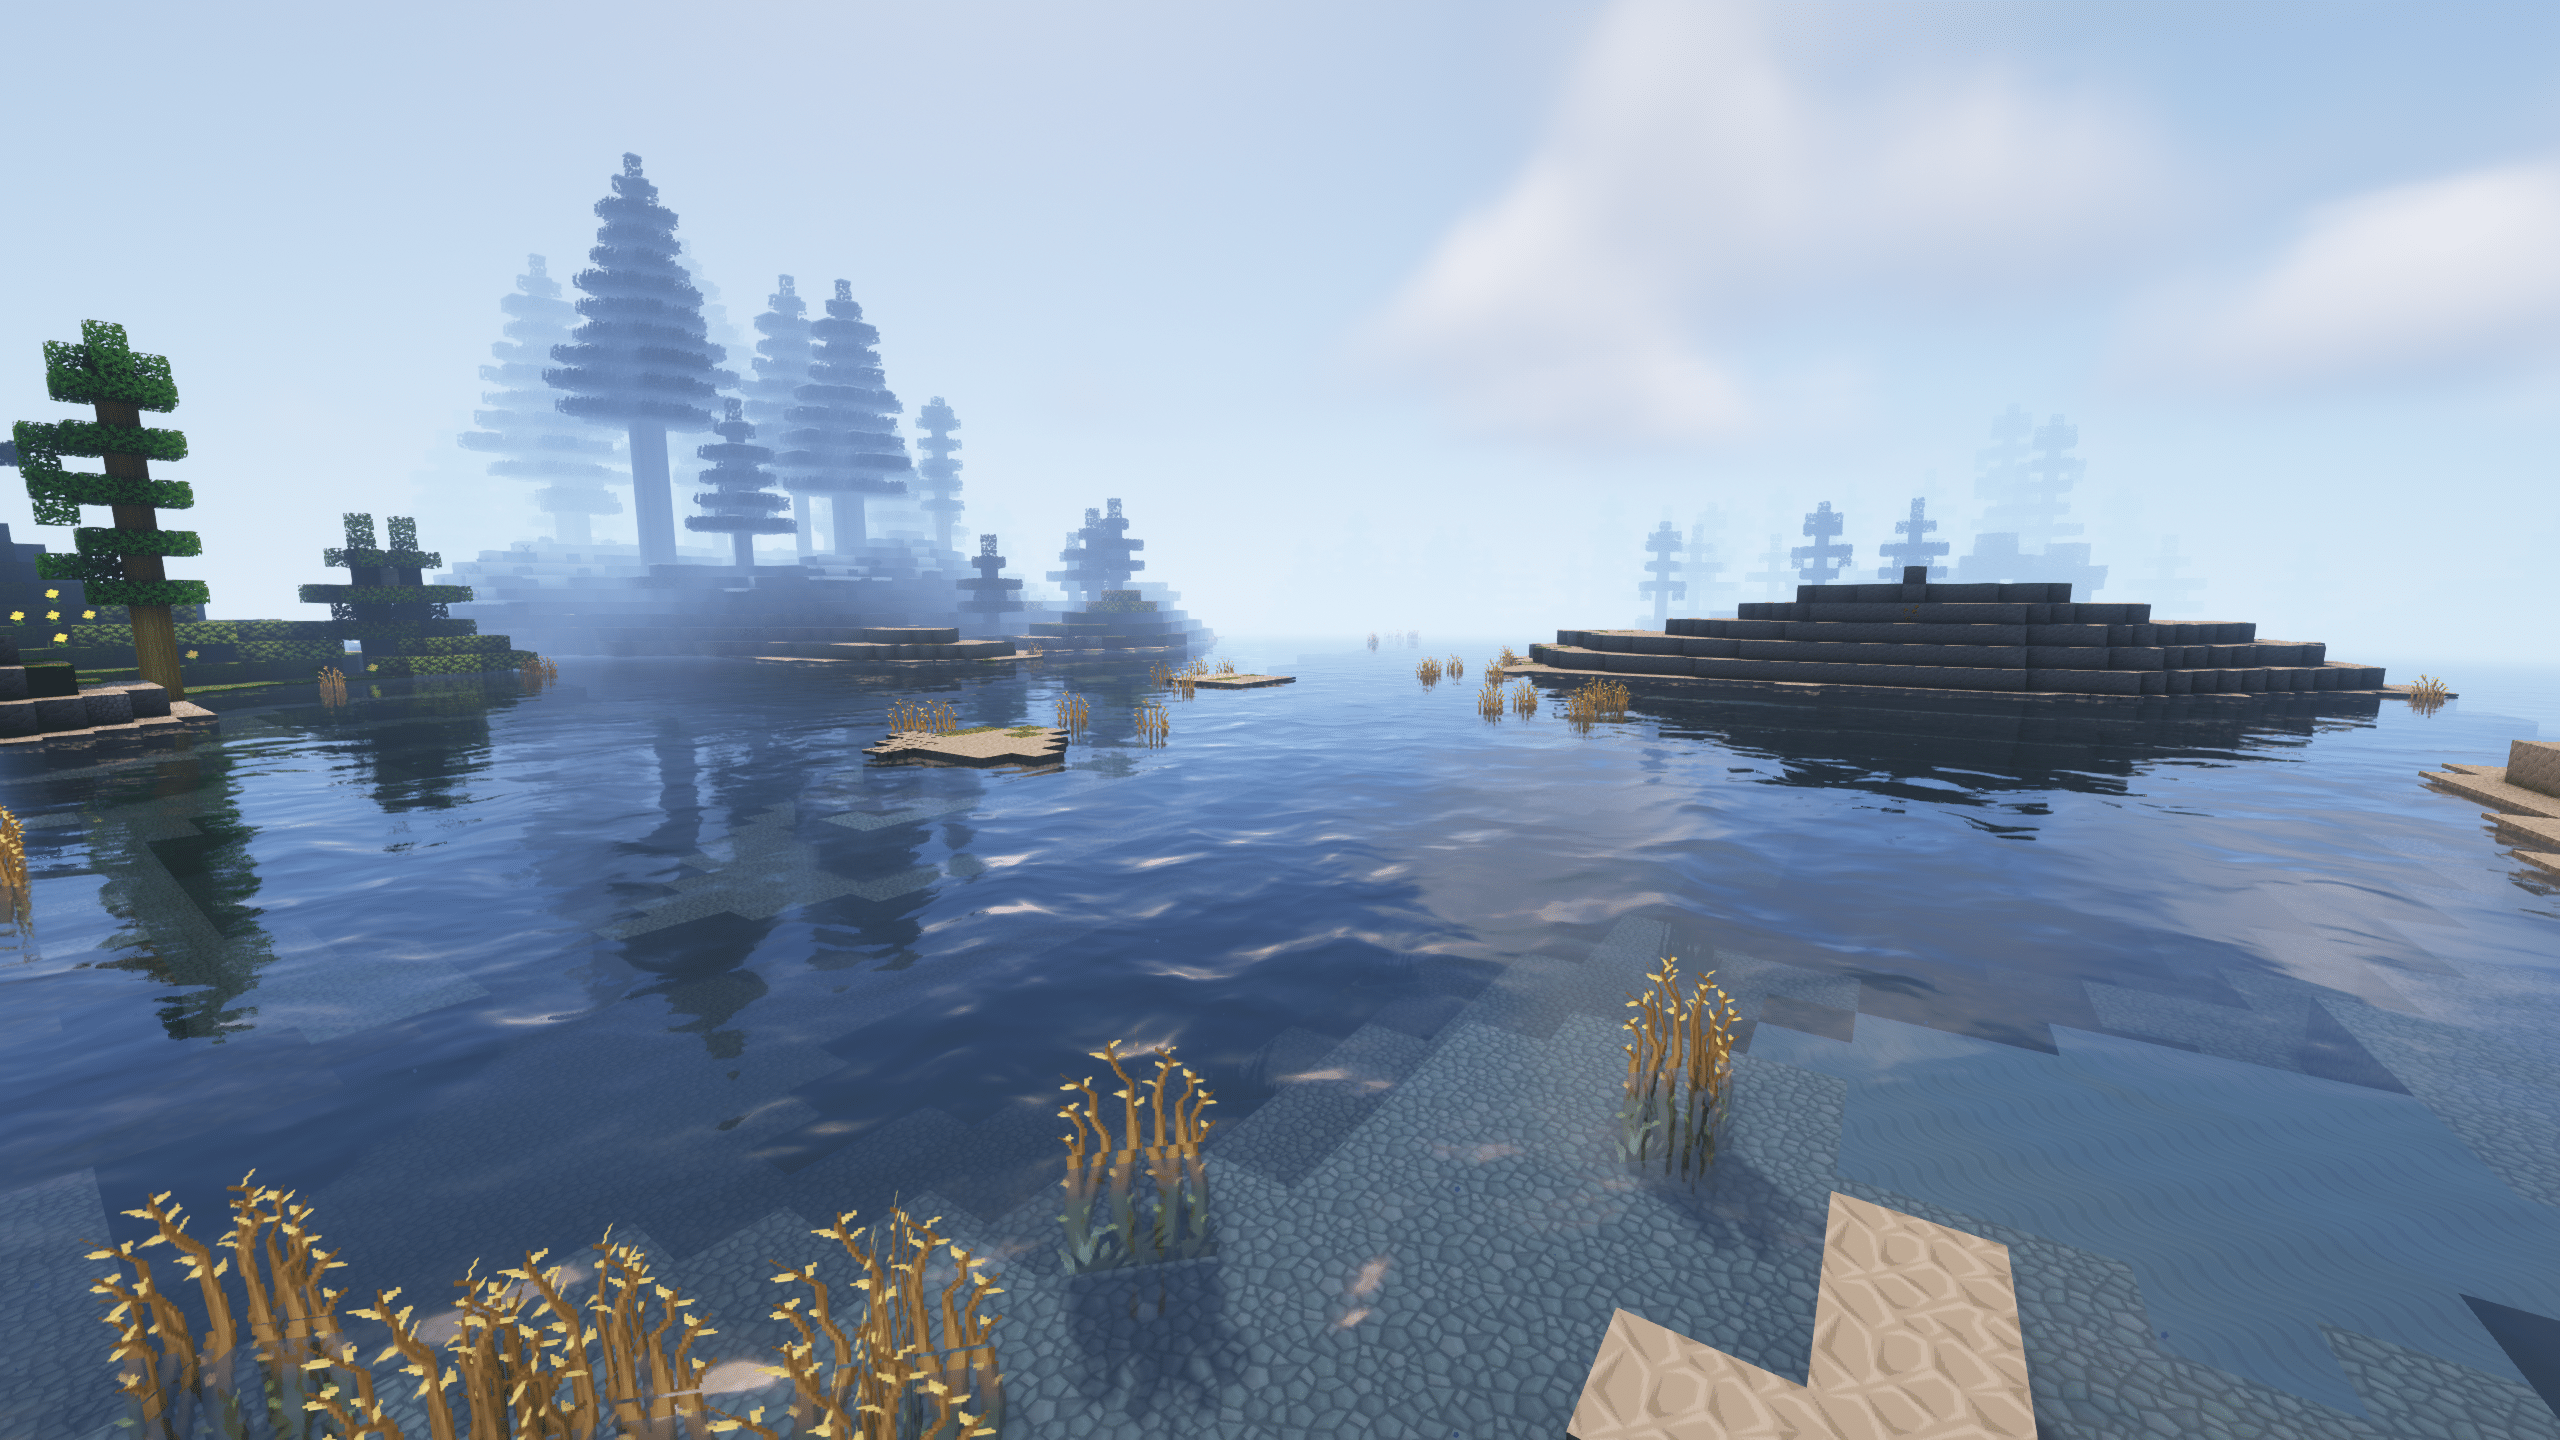 Minecraft Enigmatica 2: Reflections